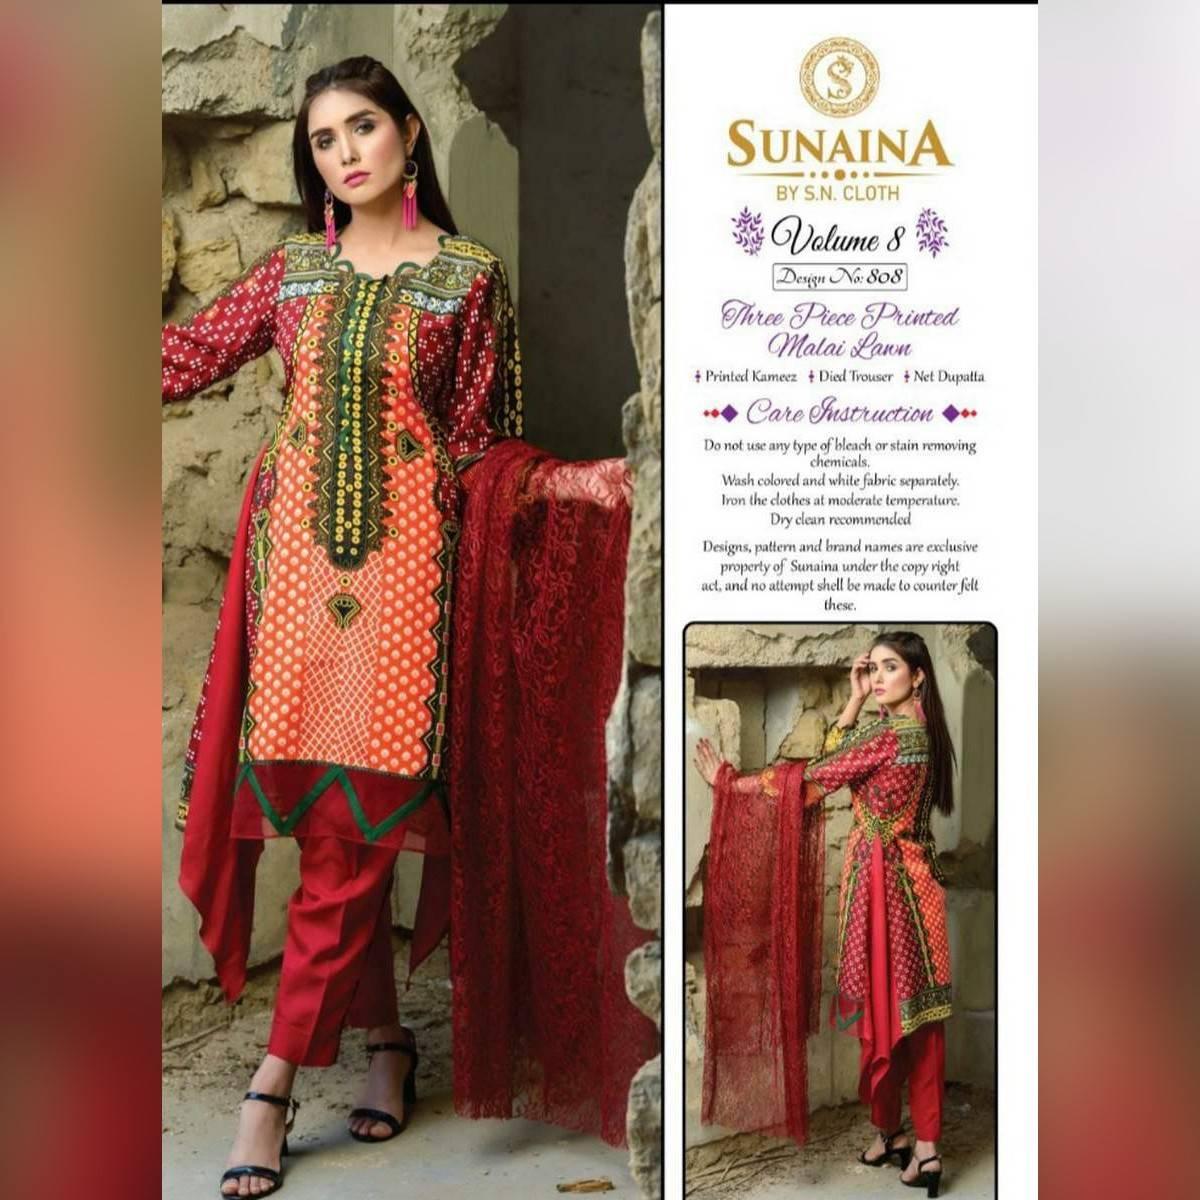 Stylish 3 Pcs Suit / Dress Printed Shirt - Net Dupatta &  Dyed Trouser -Unstitched